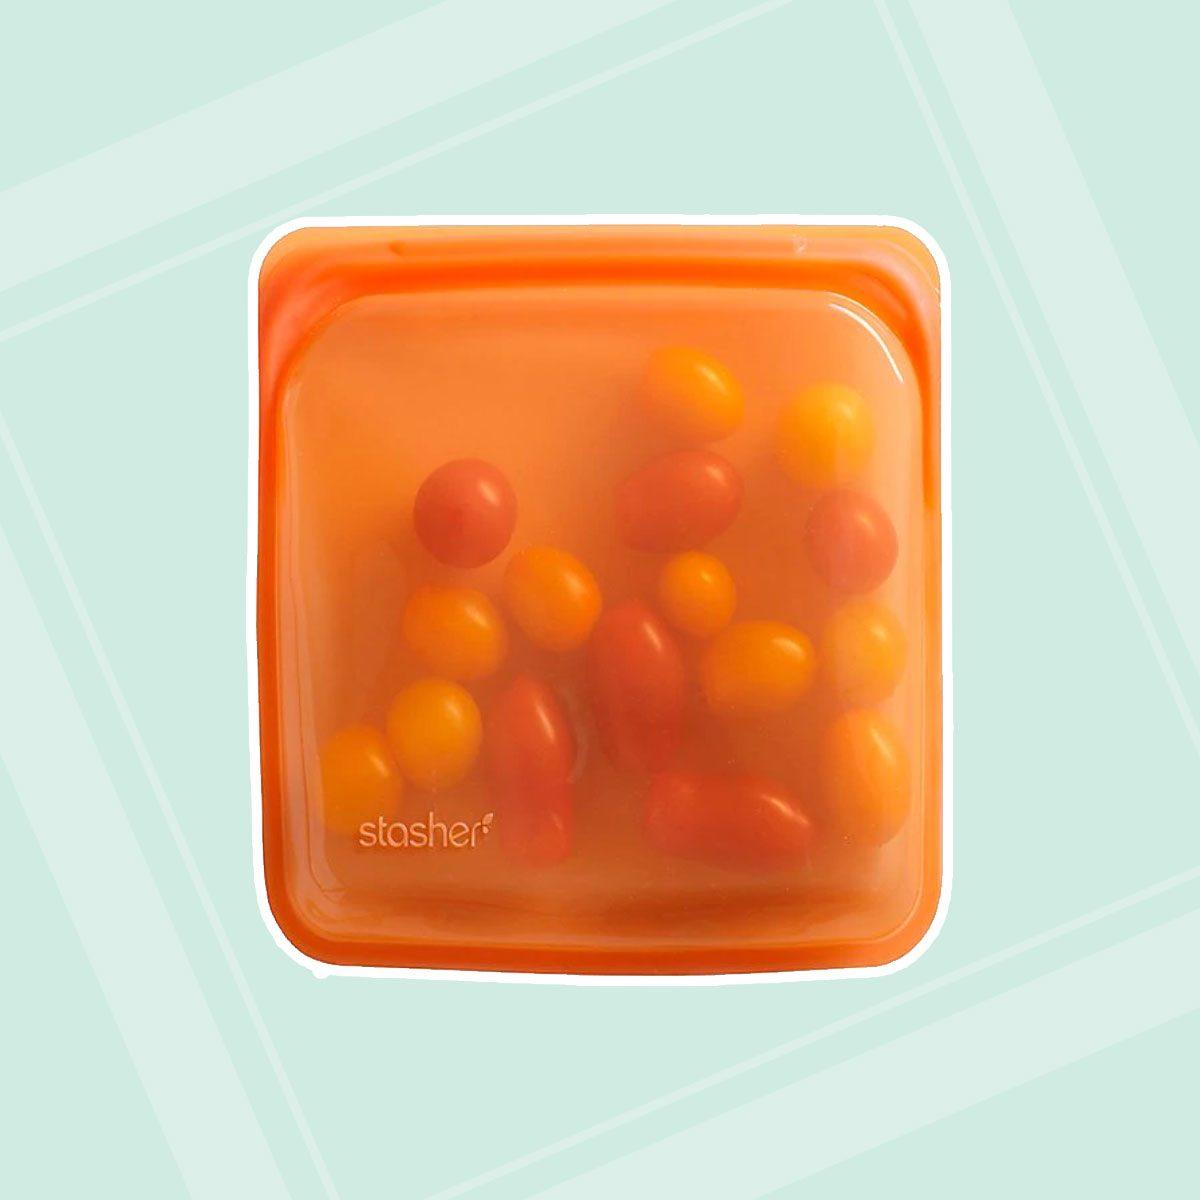 Stasher Reusable 15 oz. Silicone Sandwich Storage Bag